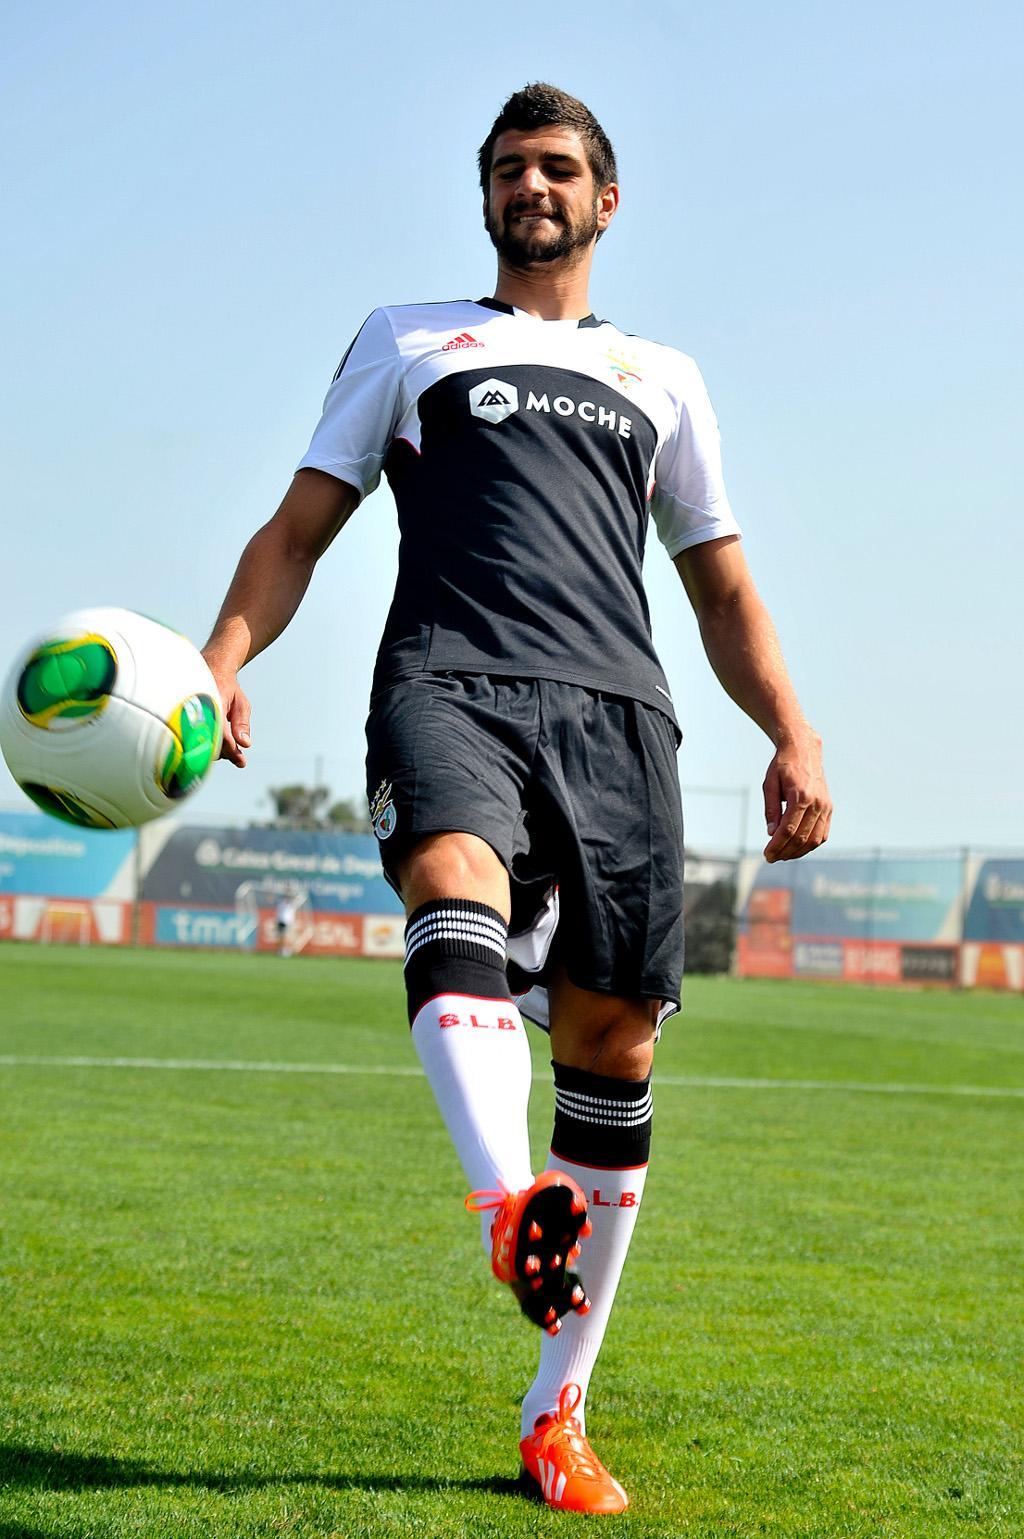 Gaitán e Mitrovic apresentam equipamento alternativo do Benfica (Lusa)